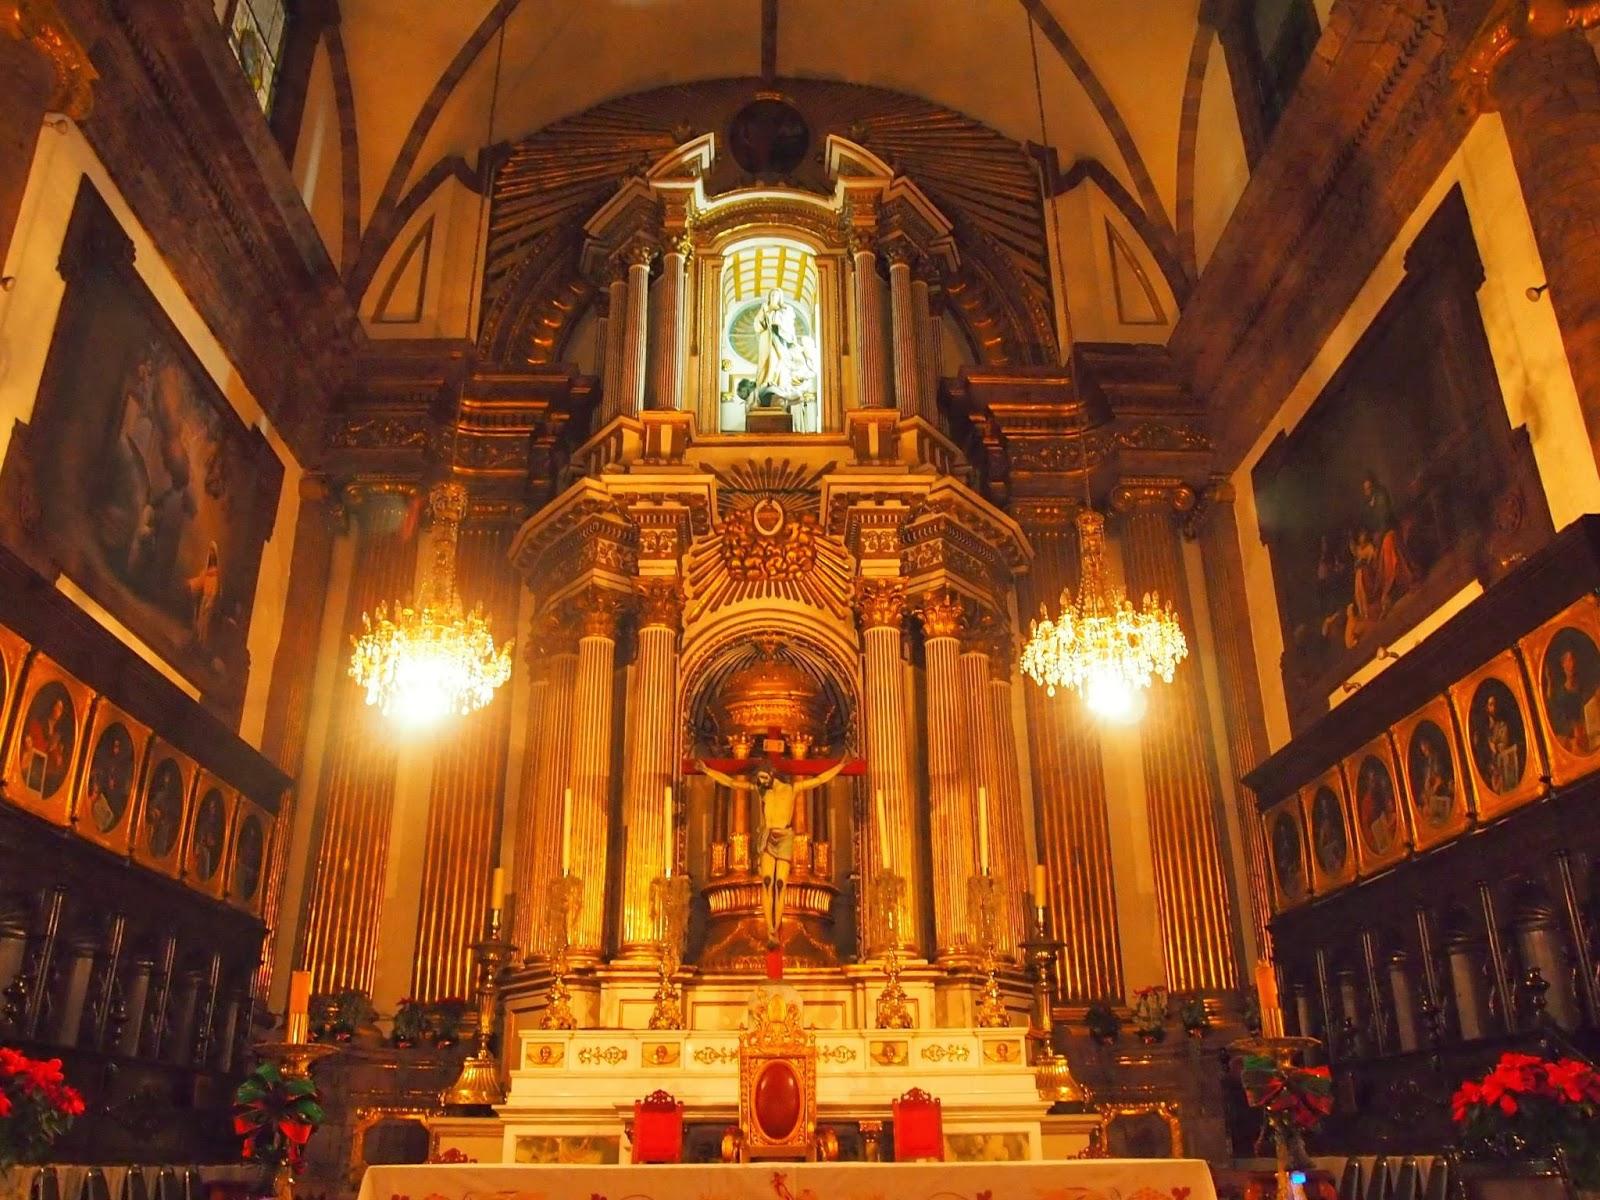 Jaime ramos m ndez altar mayor de la catedral de zamora for Catedral de zamora interior